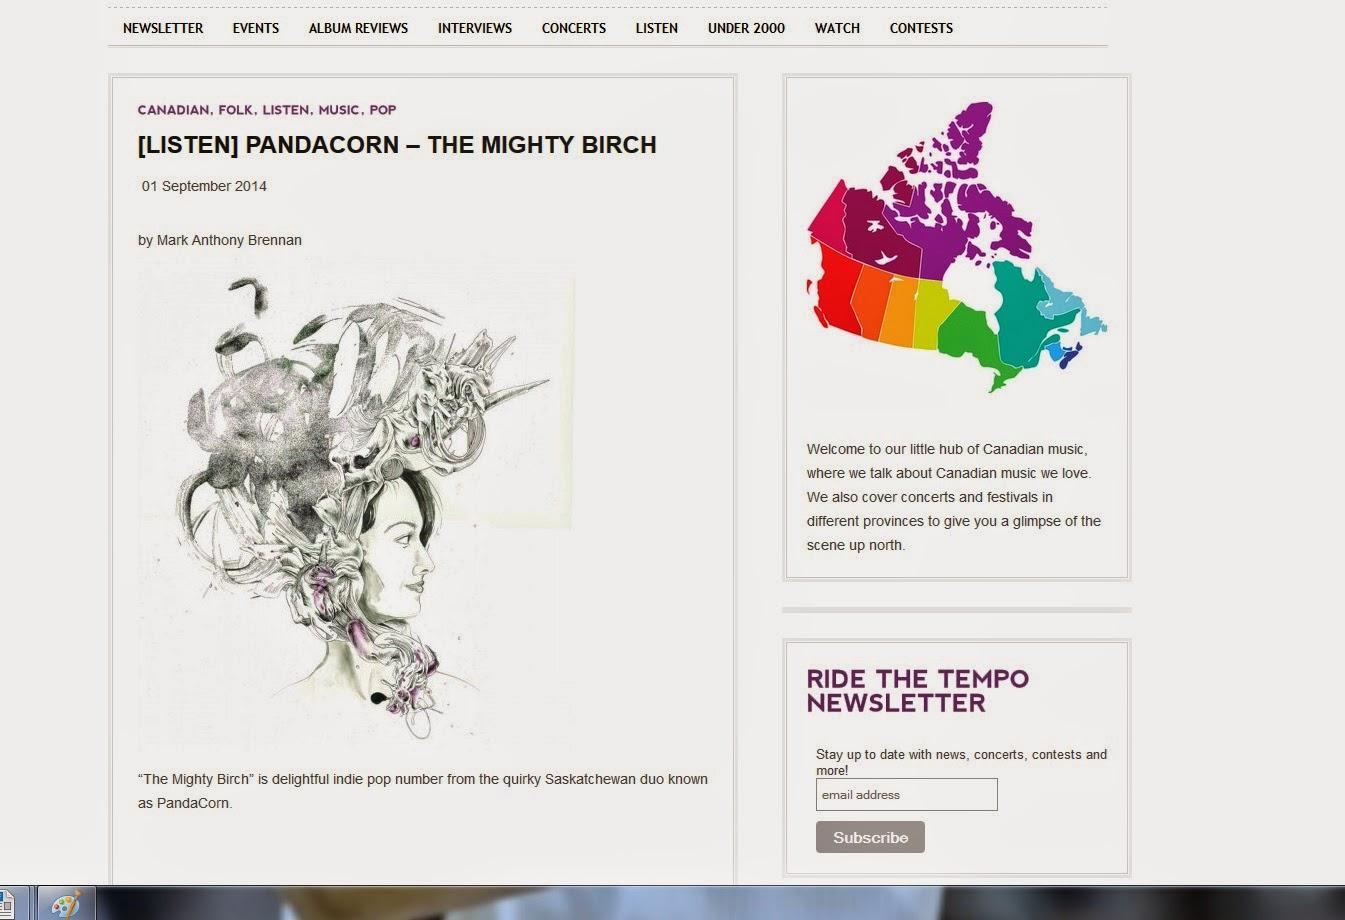 http://ridethetempo.com/2014/09/01/listen-pandacorn-mighty-birch/